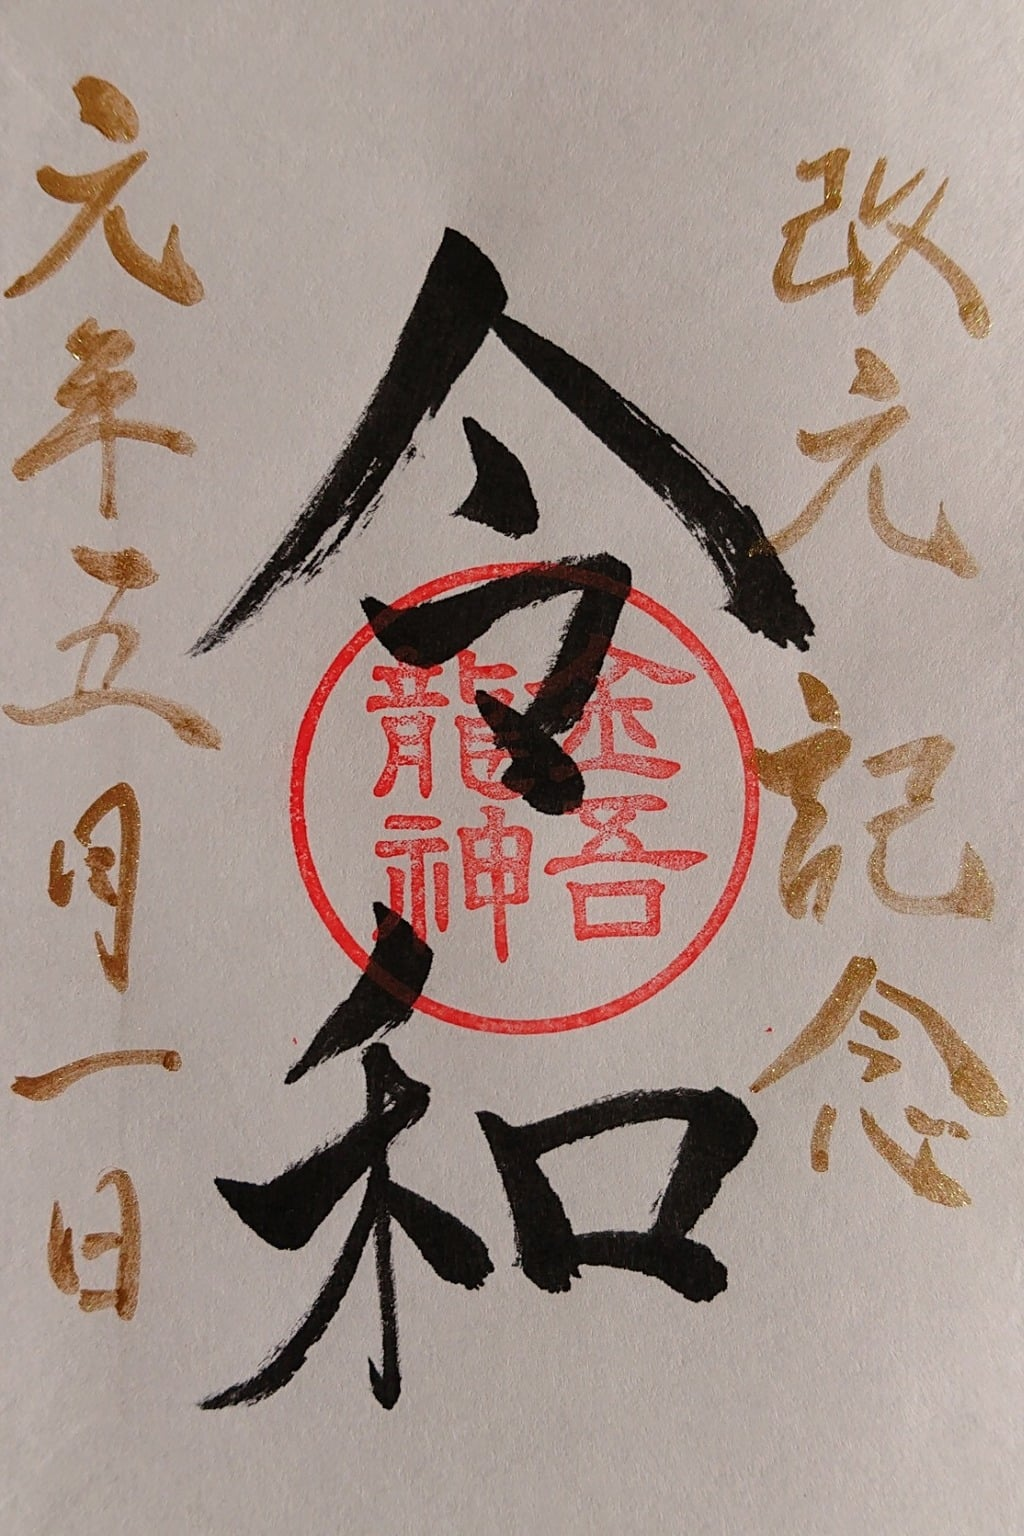 金吾龍神社 東京分祠の御朱印